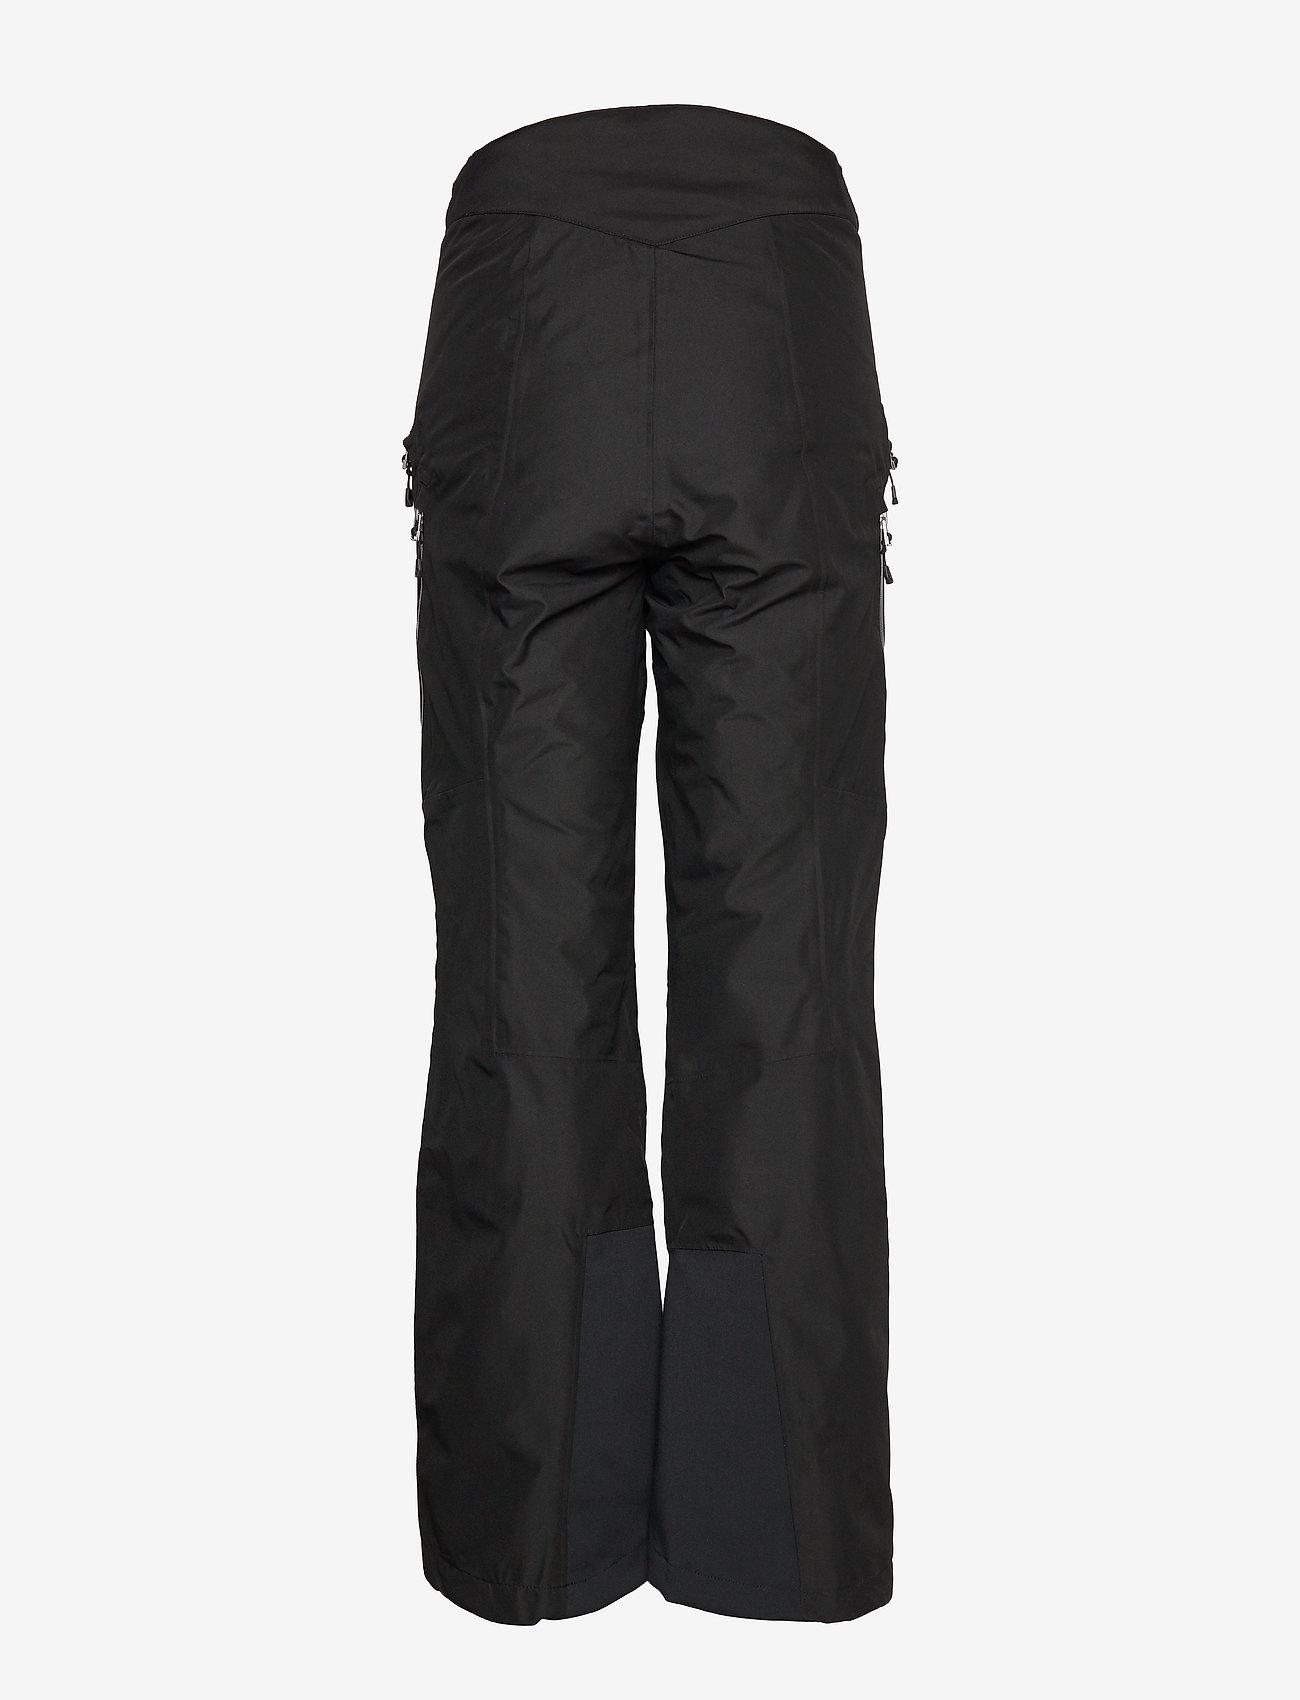 Bergans - Stranda Ins W Pnt - insulated pants - black/solidcharcoal - 1